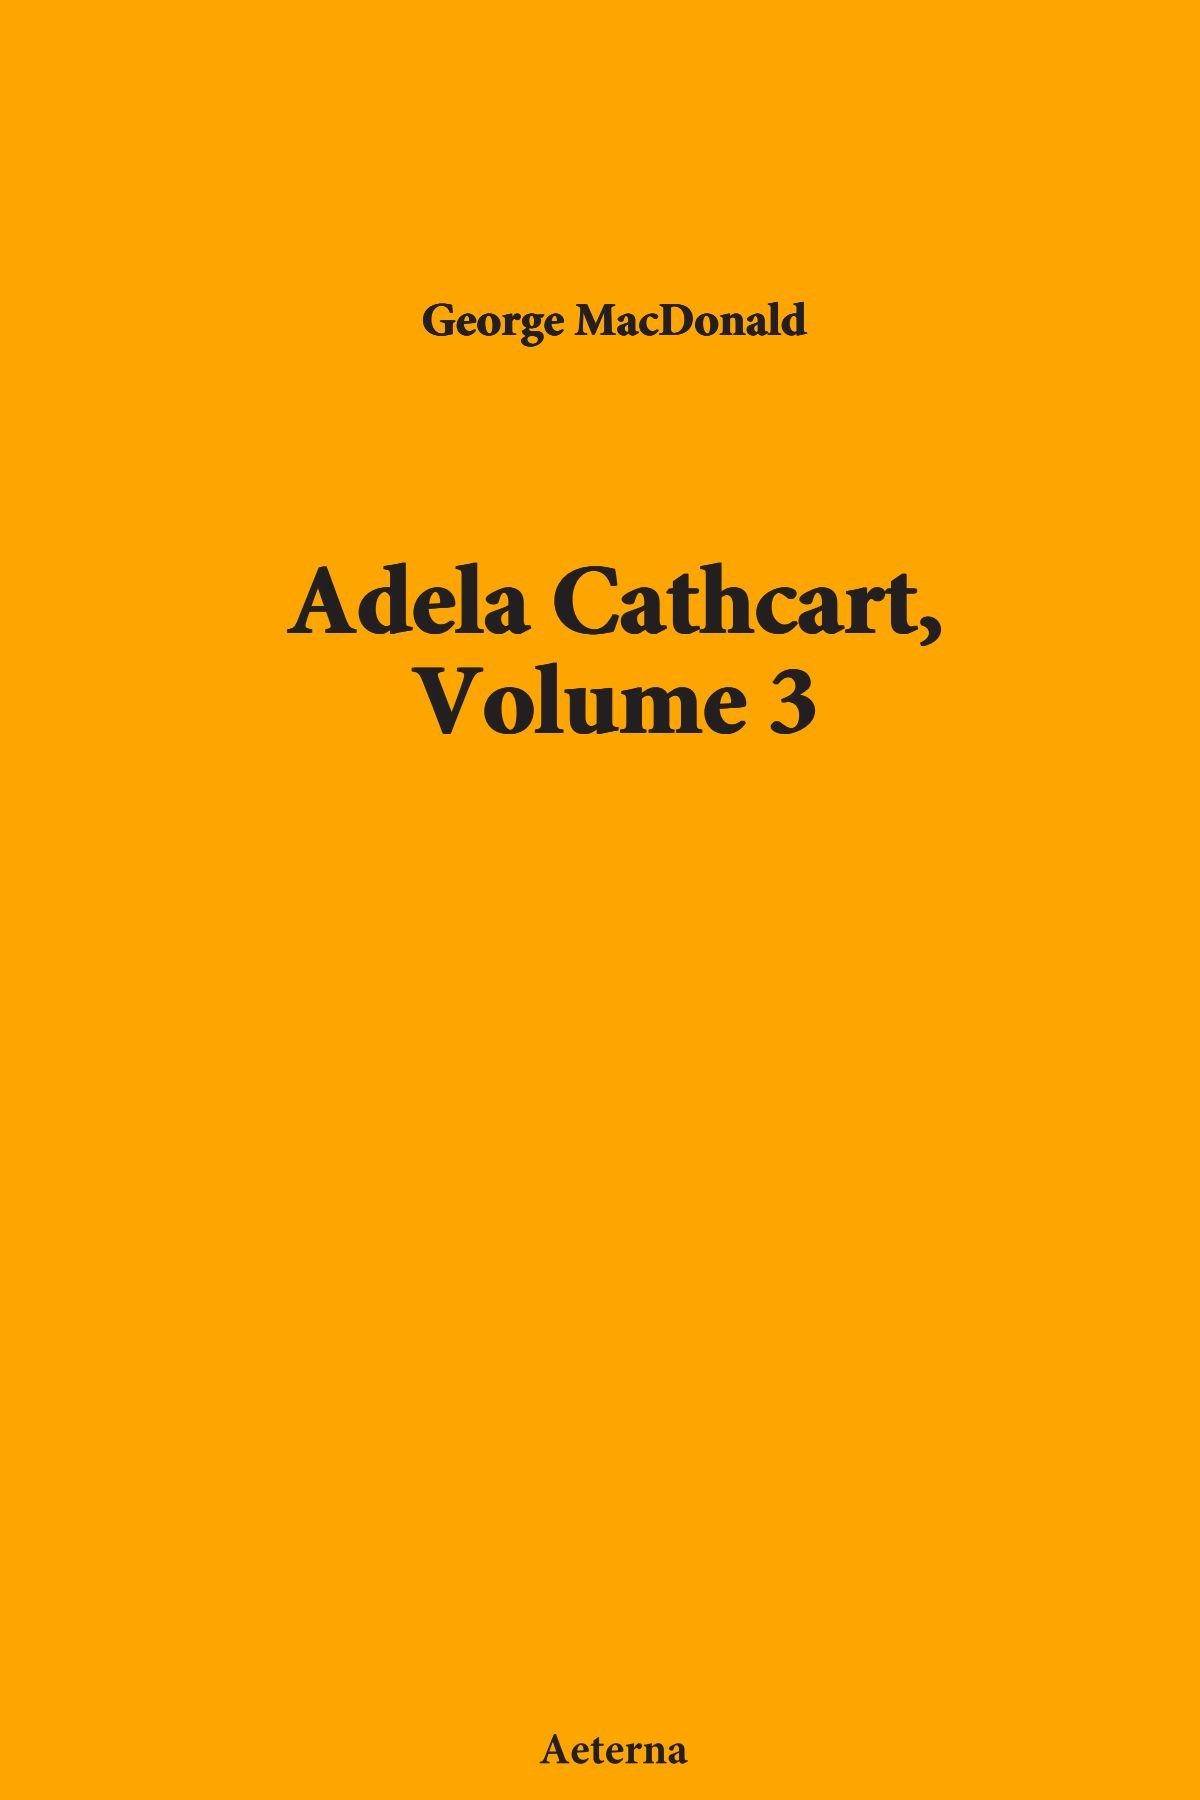 Adela Cathcart, Volume 3 pdf